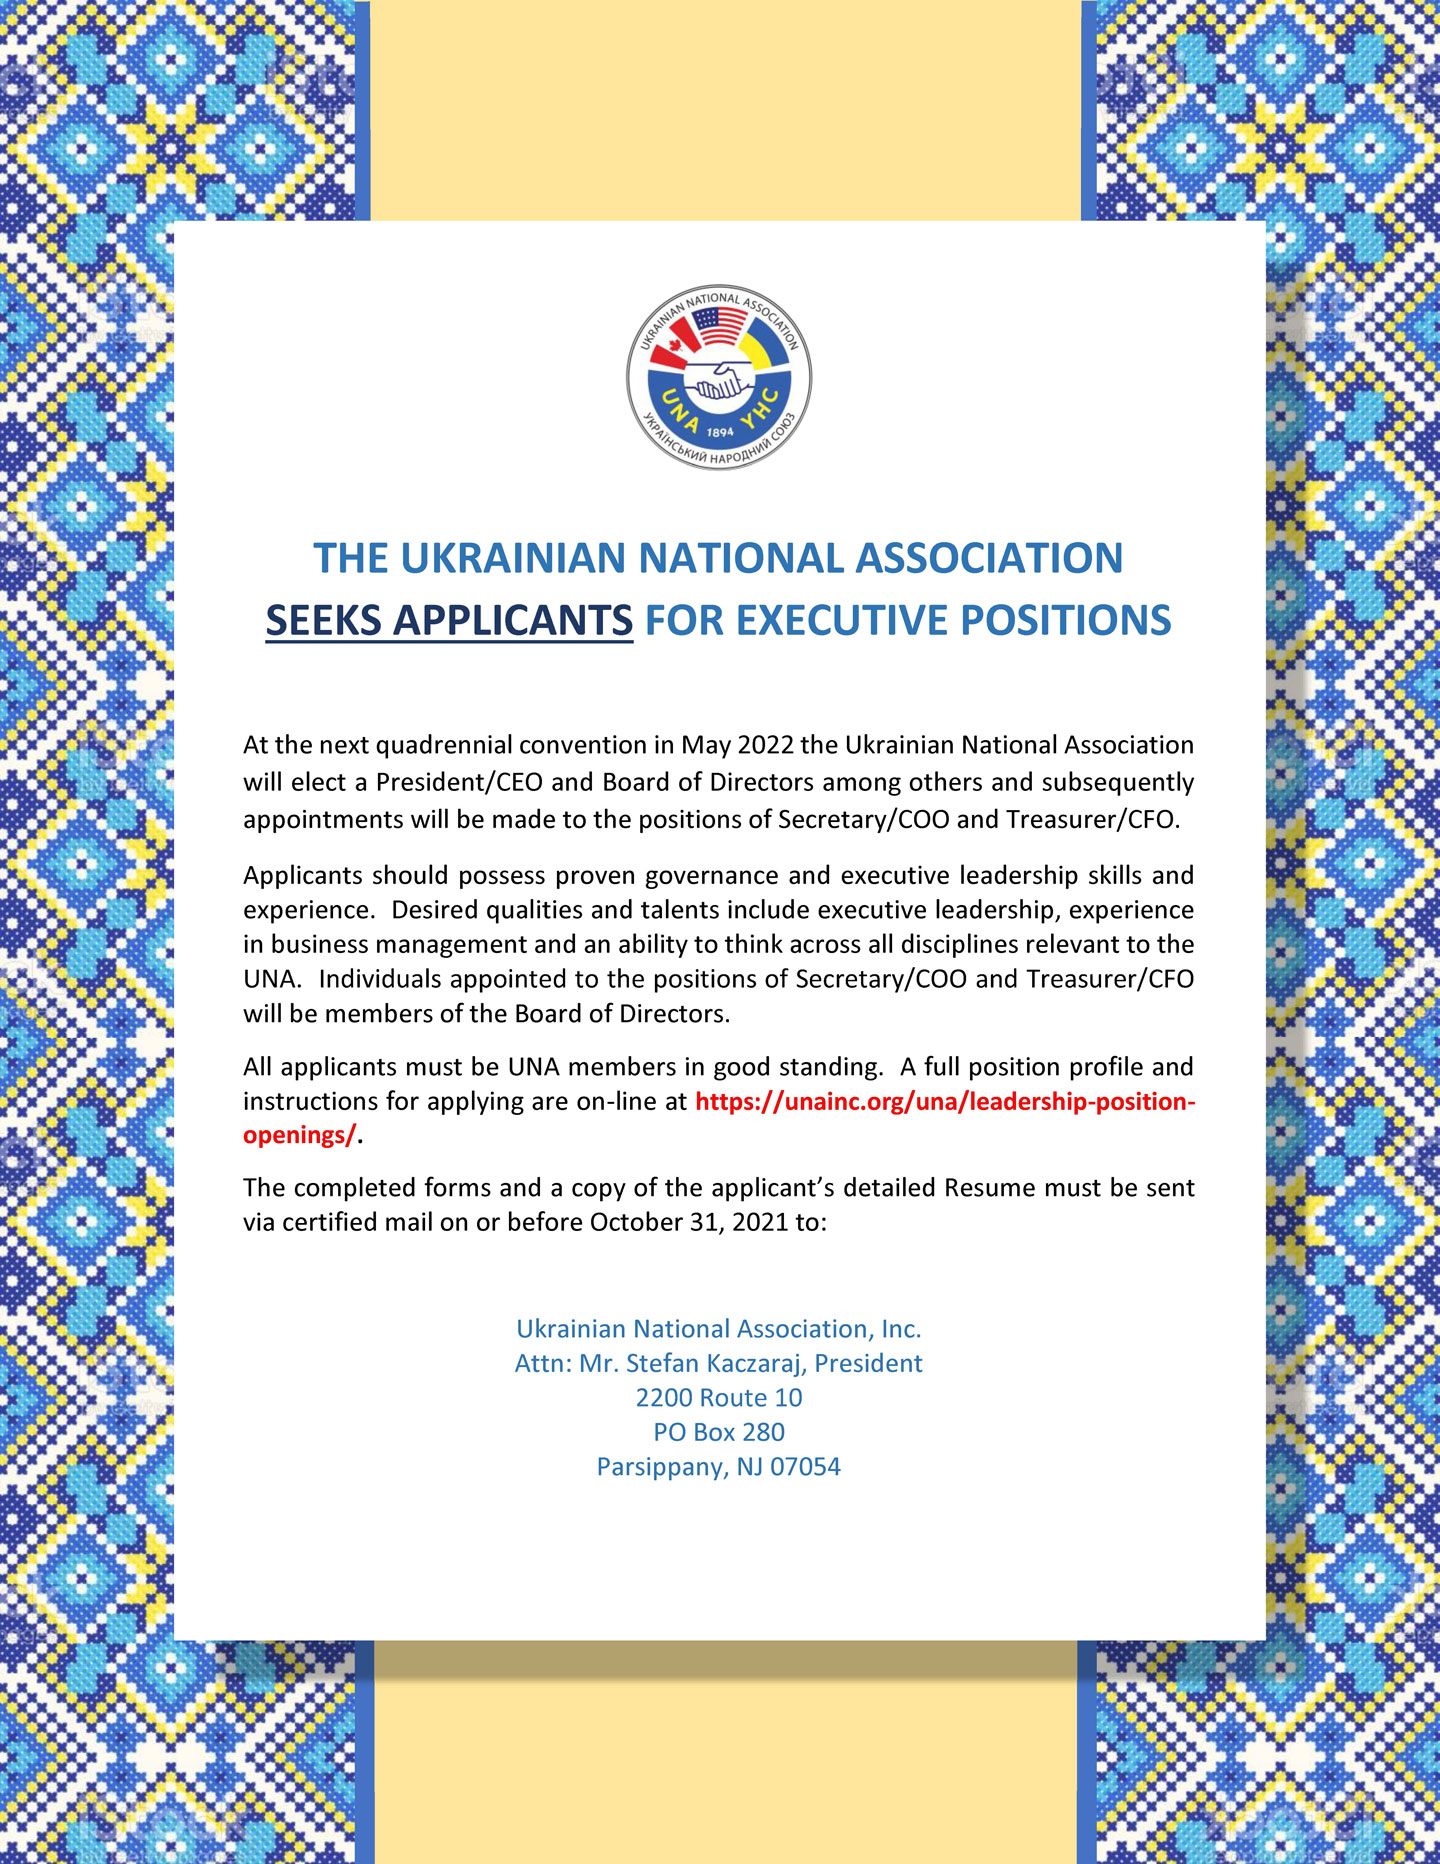 The Ukrainian National Association Seeks Applicants For Executive Positions